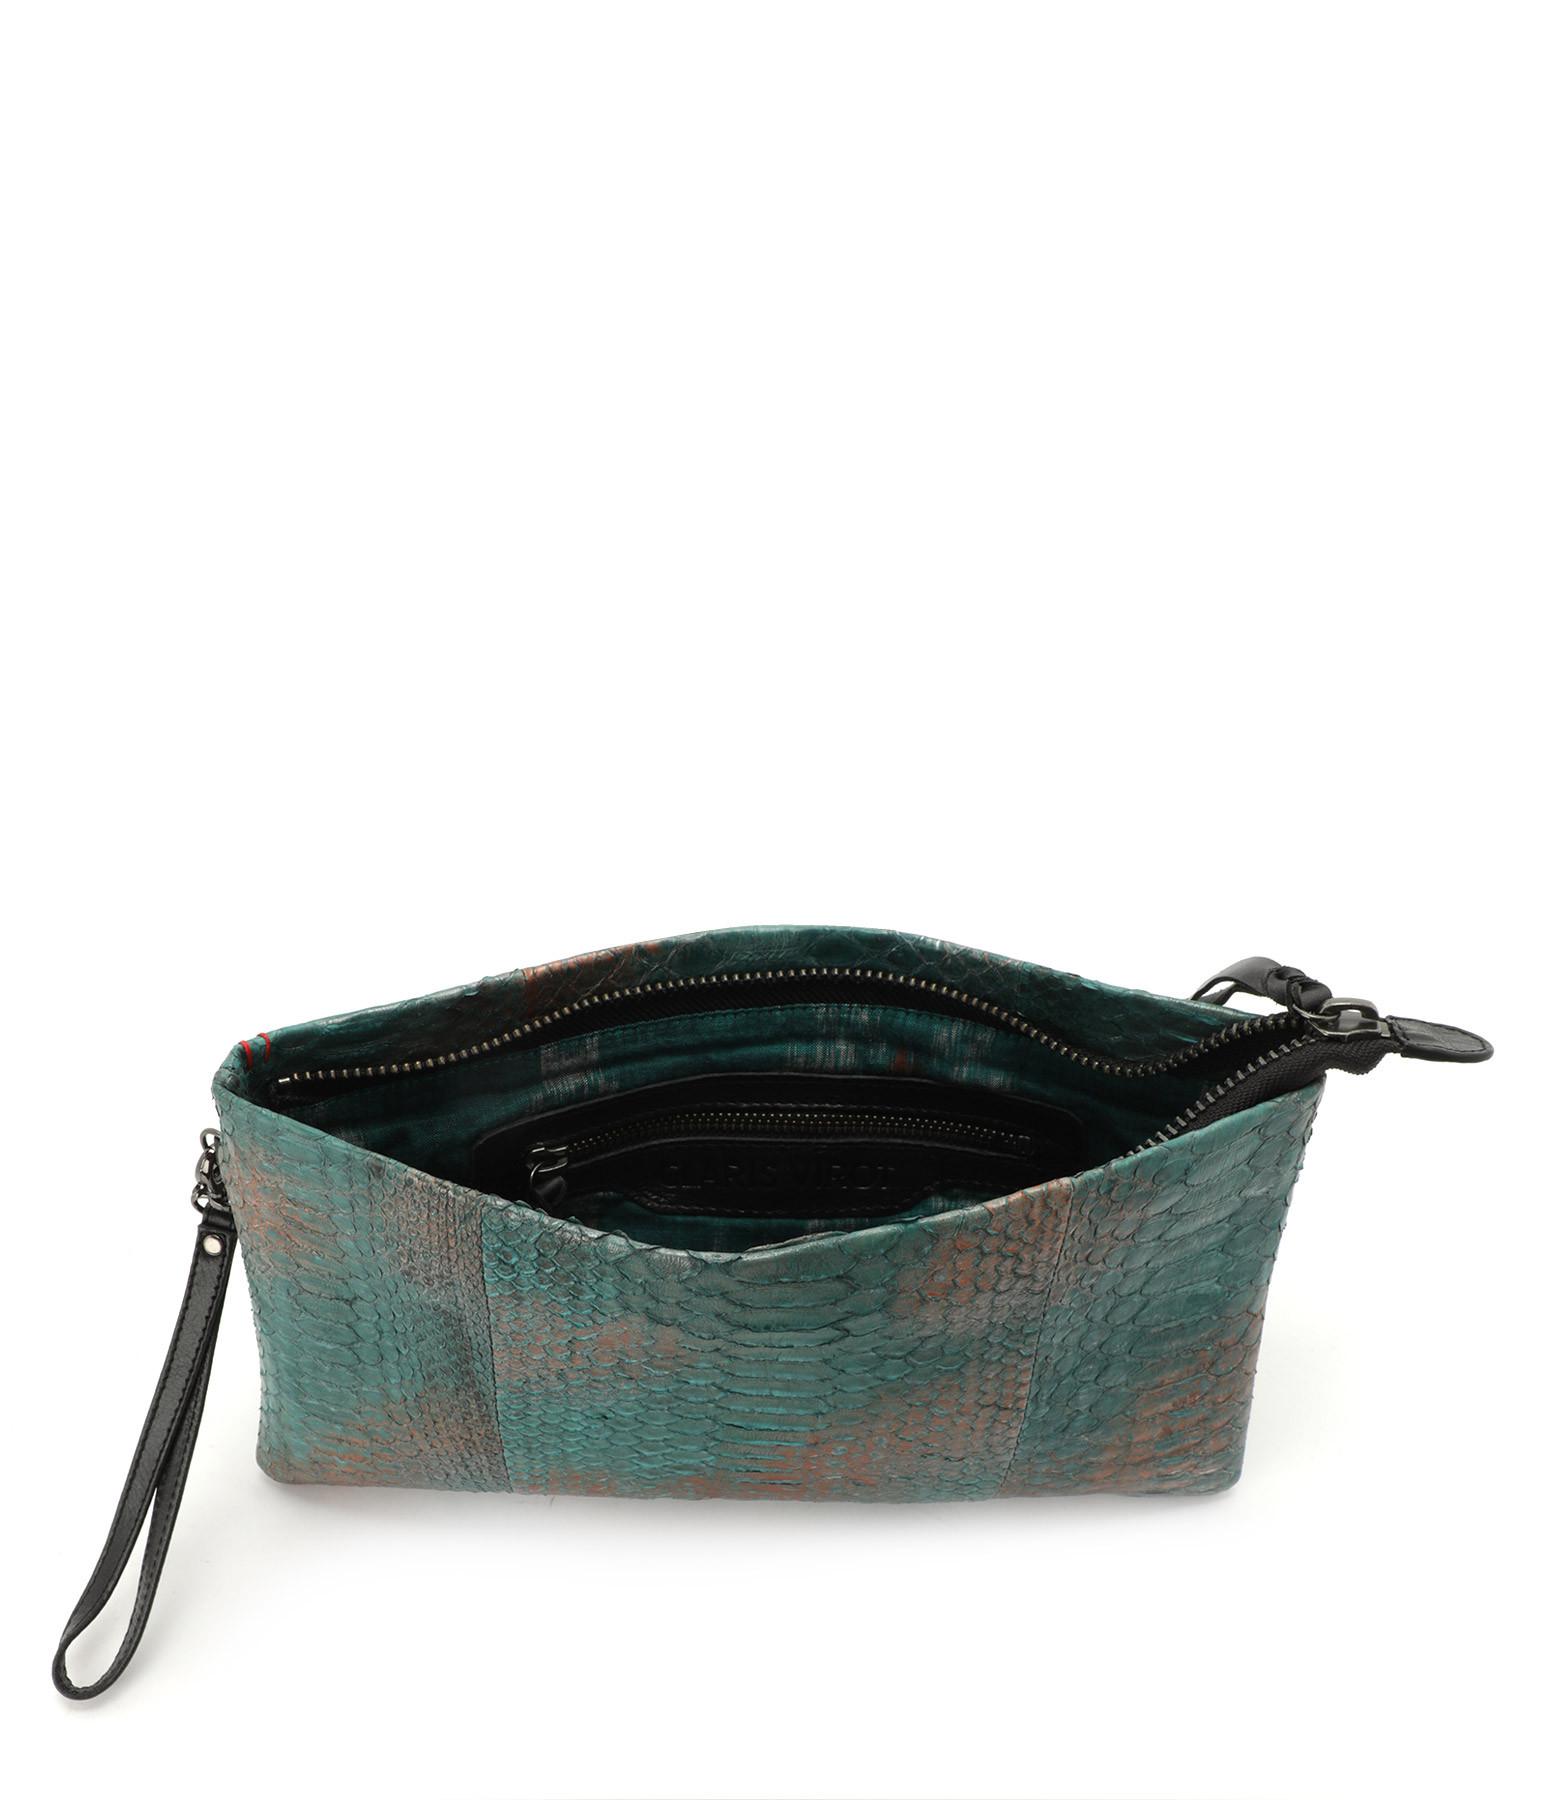 CLARIS VIROT - Pochette Lou Python Aqua